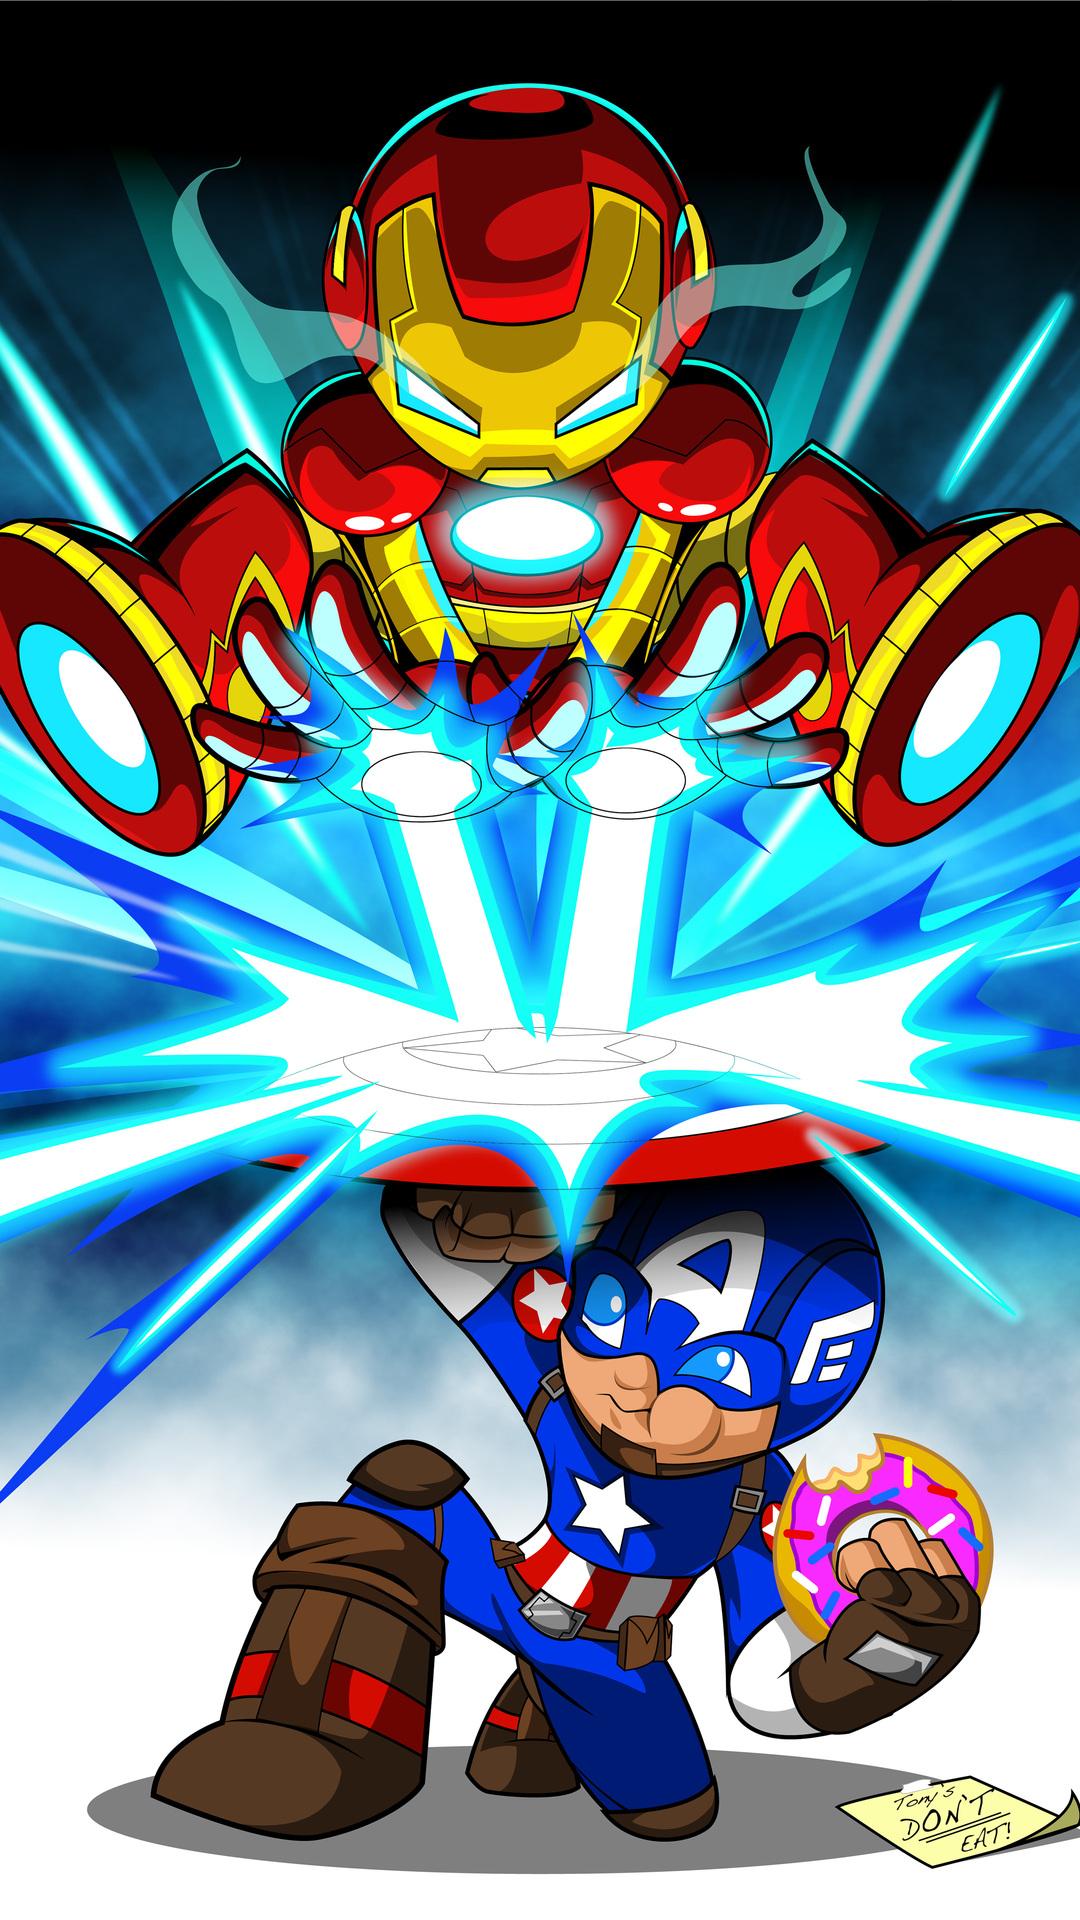 1080x1920 Iron Man Cartoon Digital Art 4k Iphone 76s6 Plus